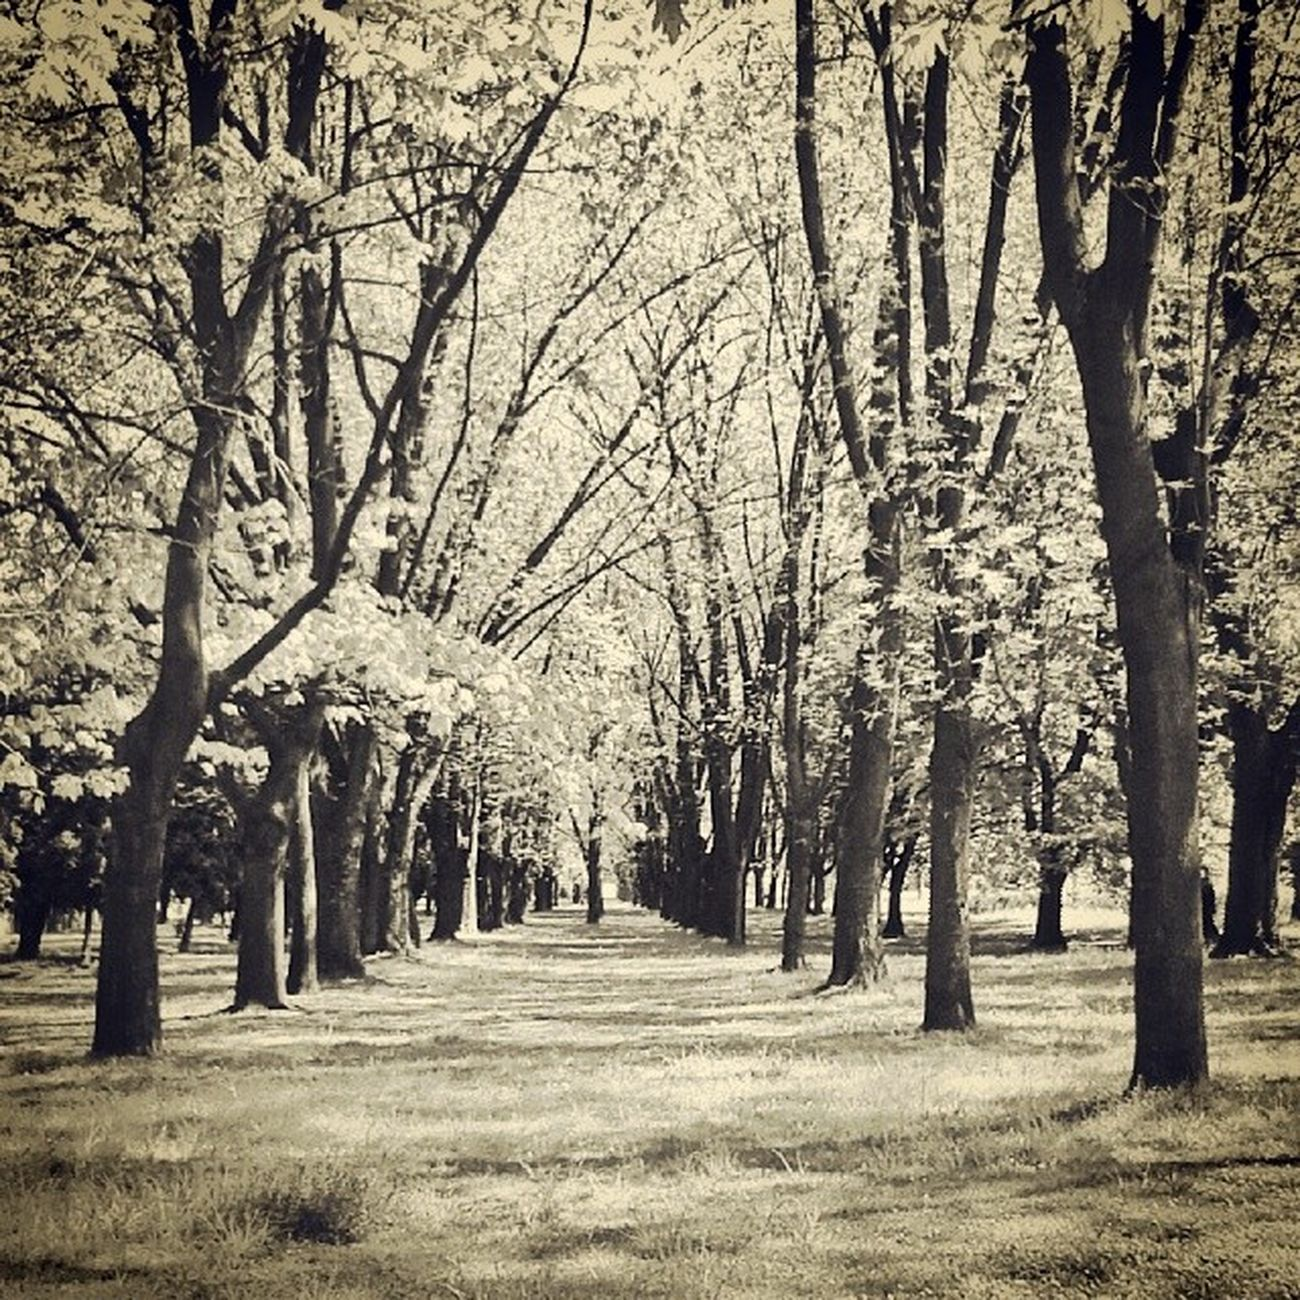 Trees Ic_trees Rsa_trees Creative composition nothingisordinary urbangardenersrepublic urban_naturelover zielonomi spring cienie bnwhisperers bnwbutnot bnwbutwhite bnw_europe bwstreet bw_poland loves_poland nature_shooters loves_naturelife youmobile igerspol topluxophotos mobilnytydzien jj_streetphotography